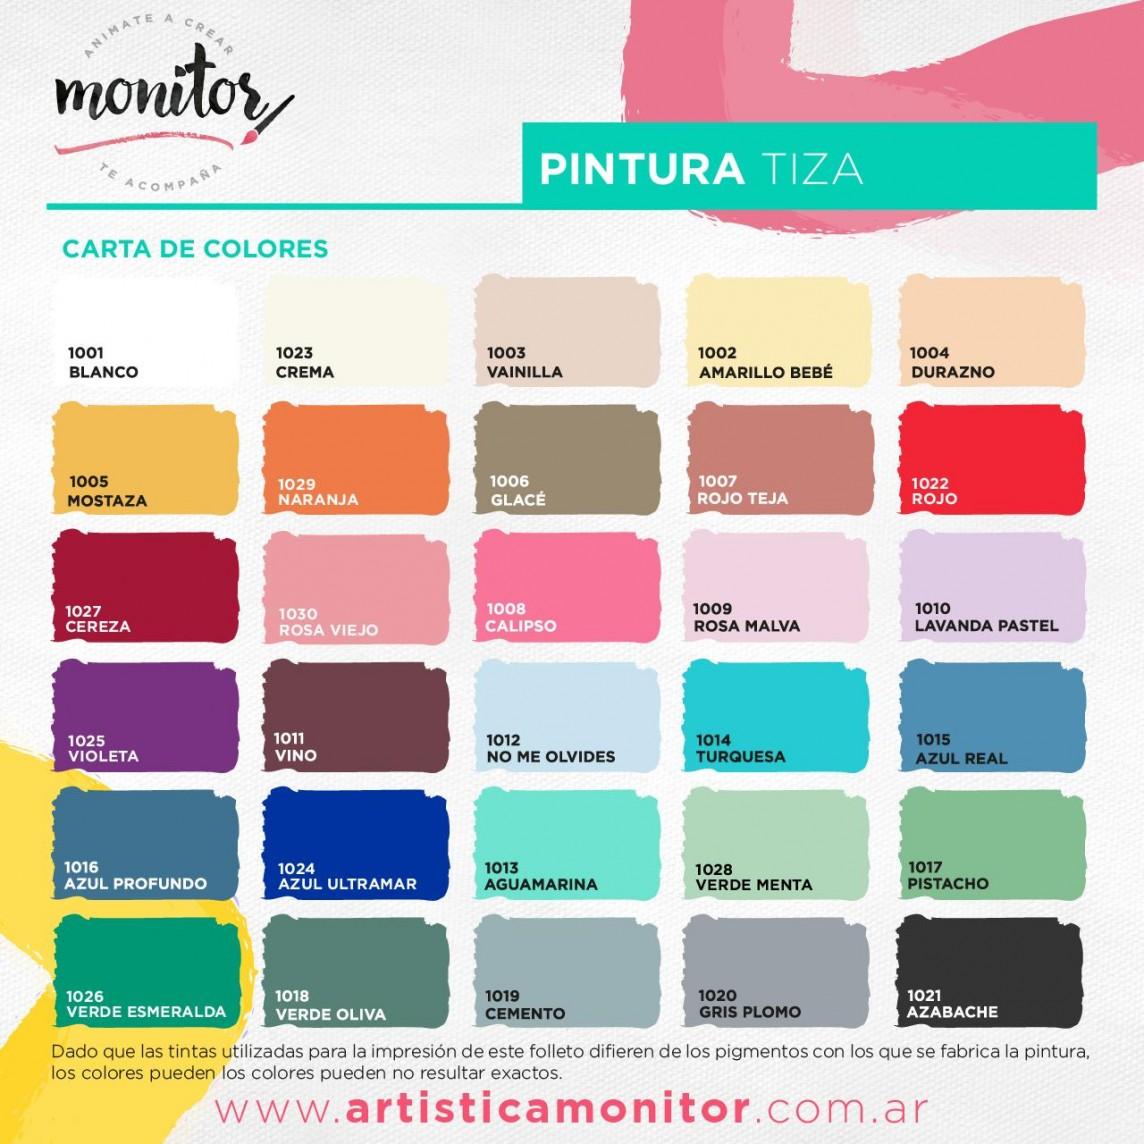 Ver colores de pinturas ver colores de pinturas with ver - Ver colores de pintura ...